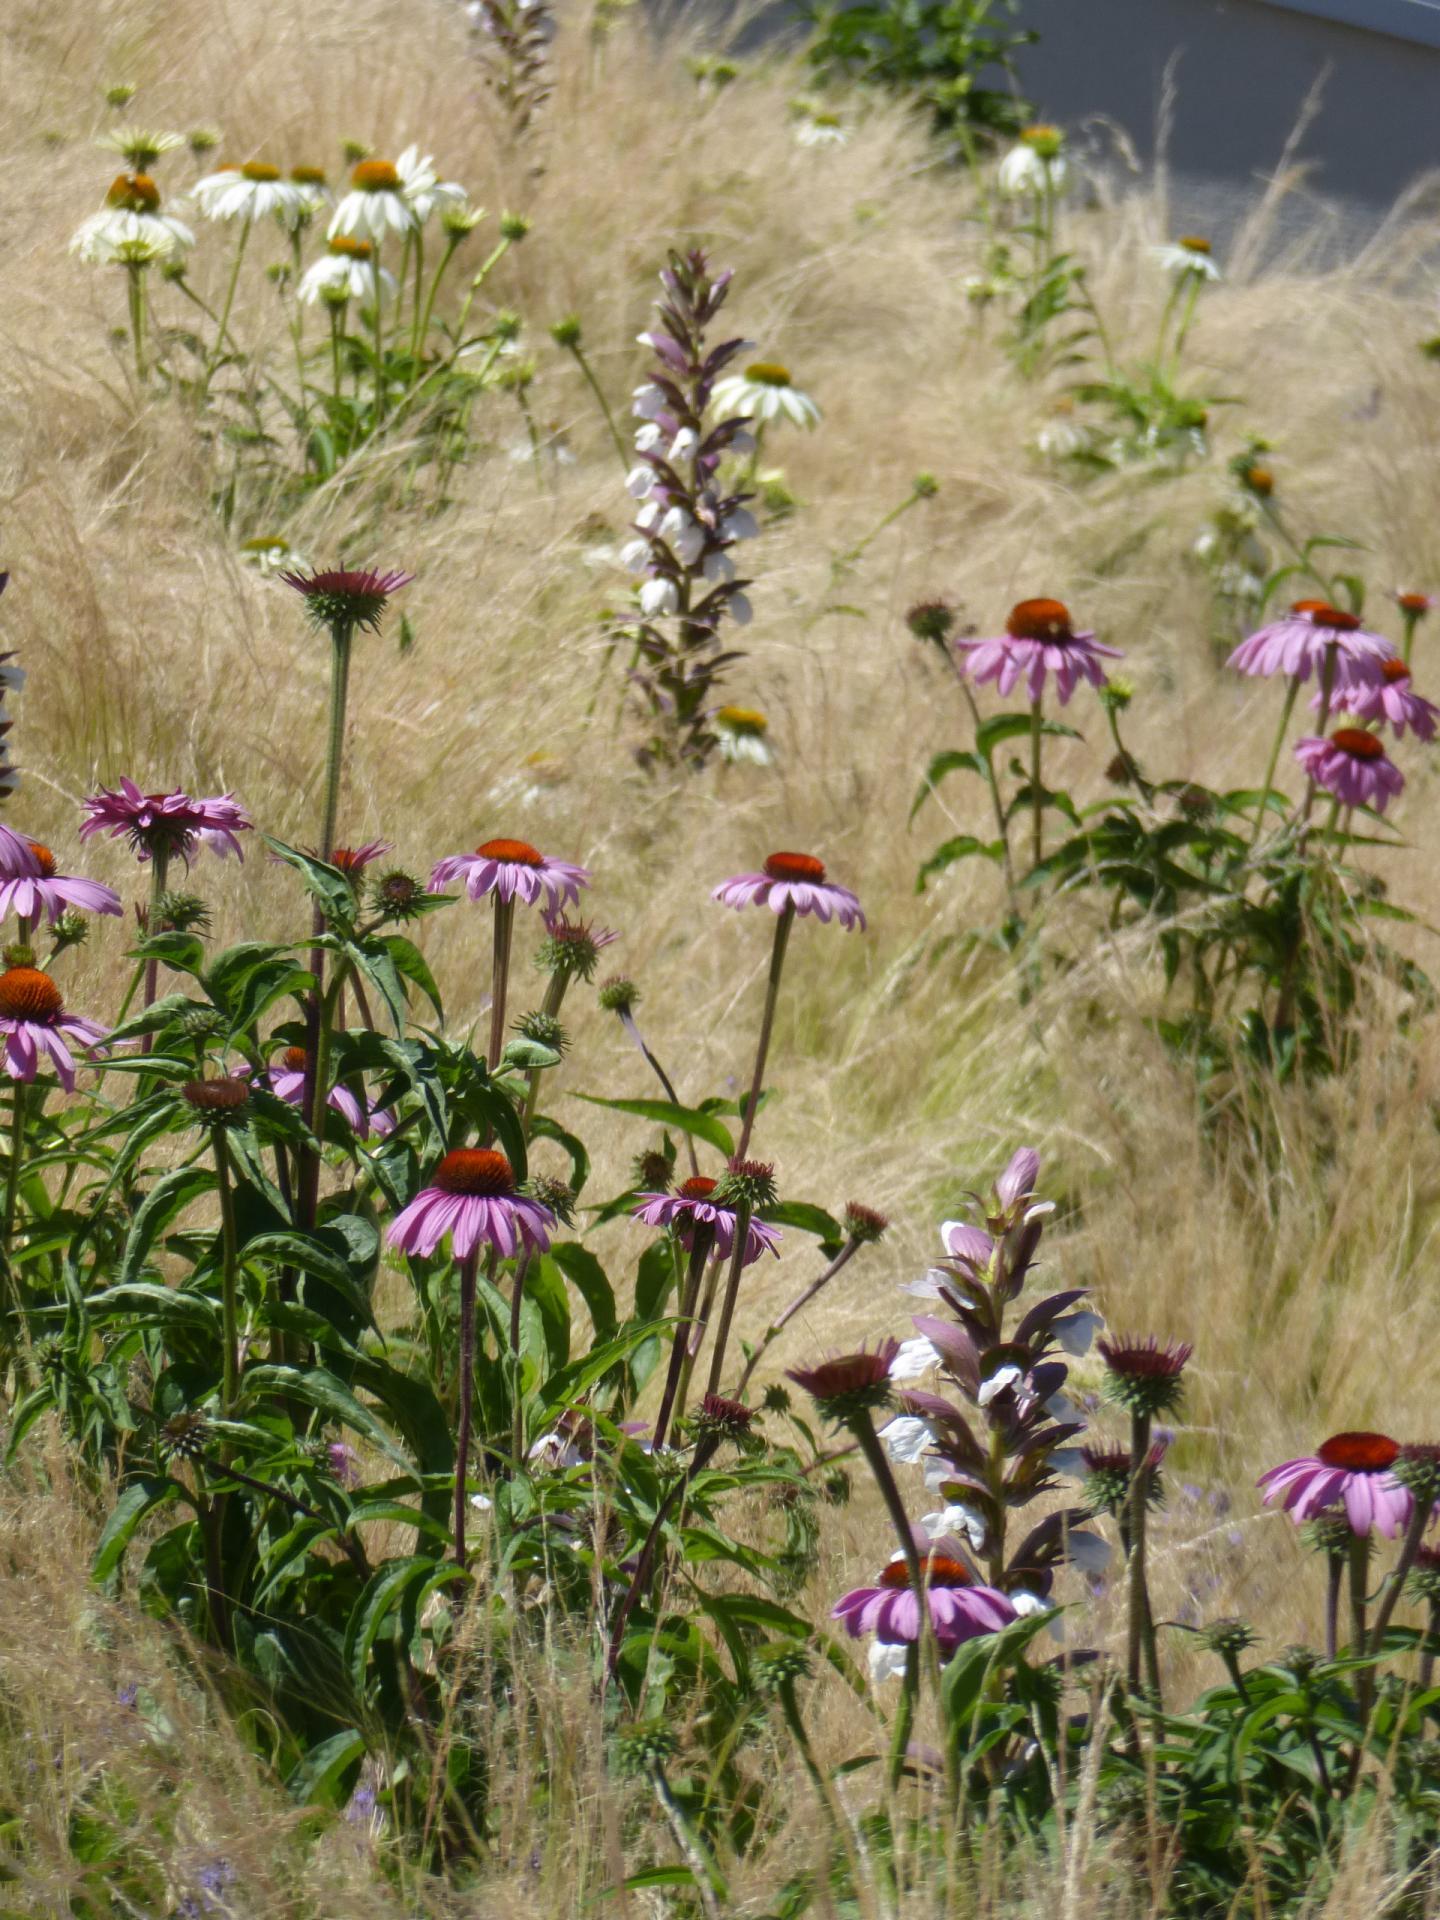 Aménagement paysager : une inspiration nature